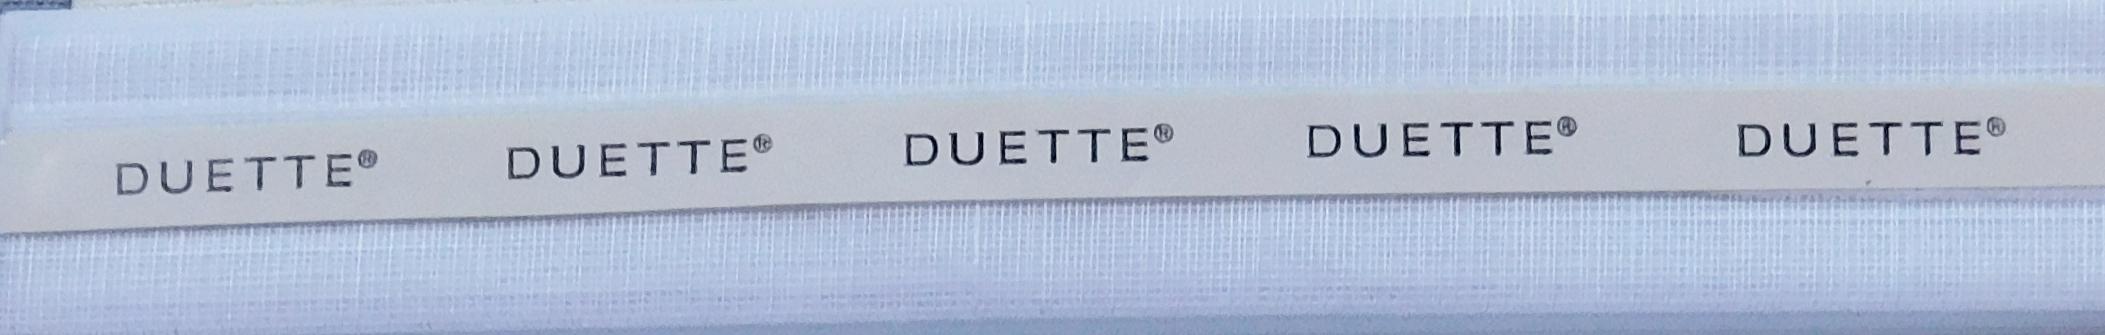 Batiste Snow Duette Blind Fabric Sample